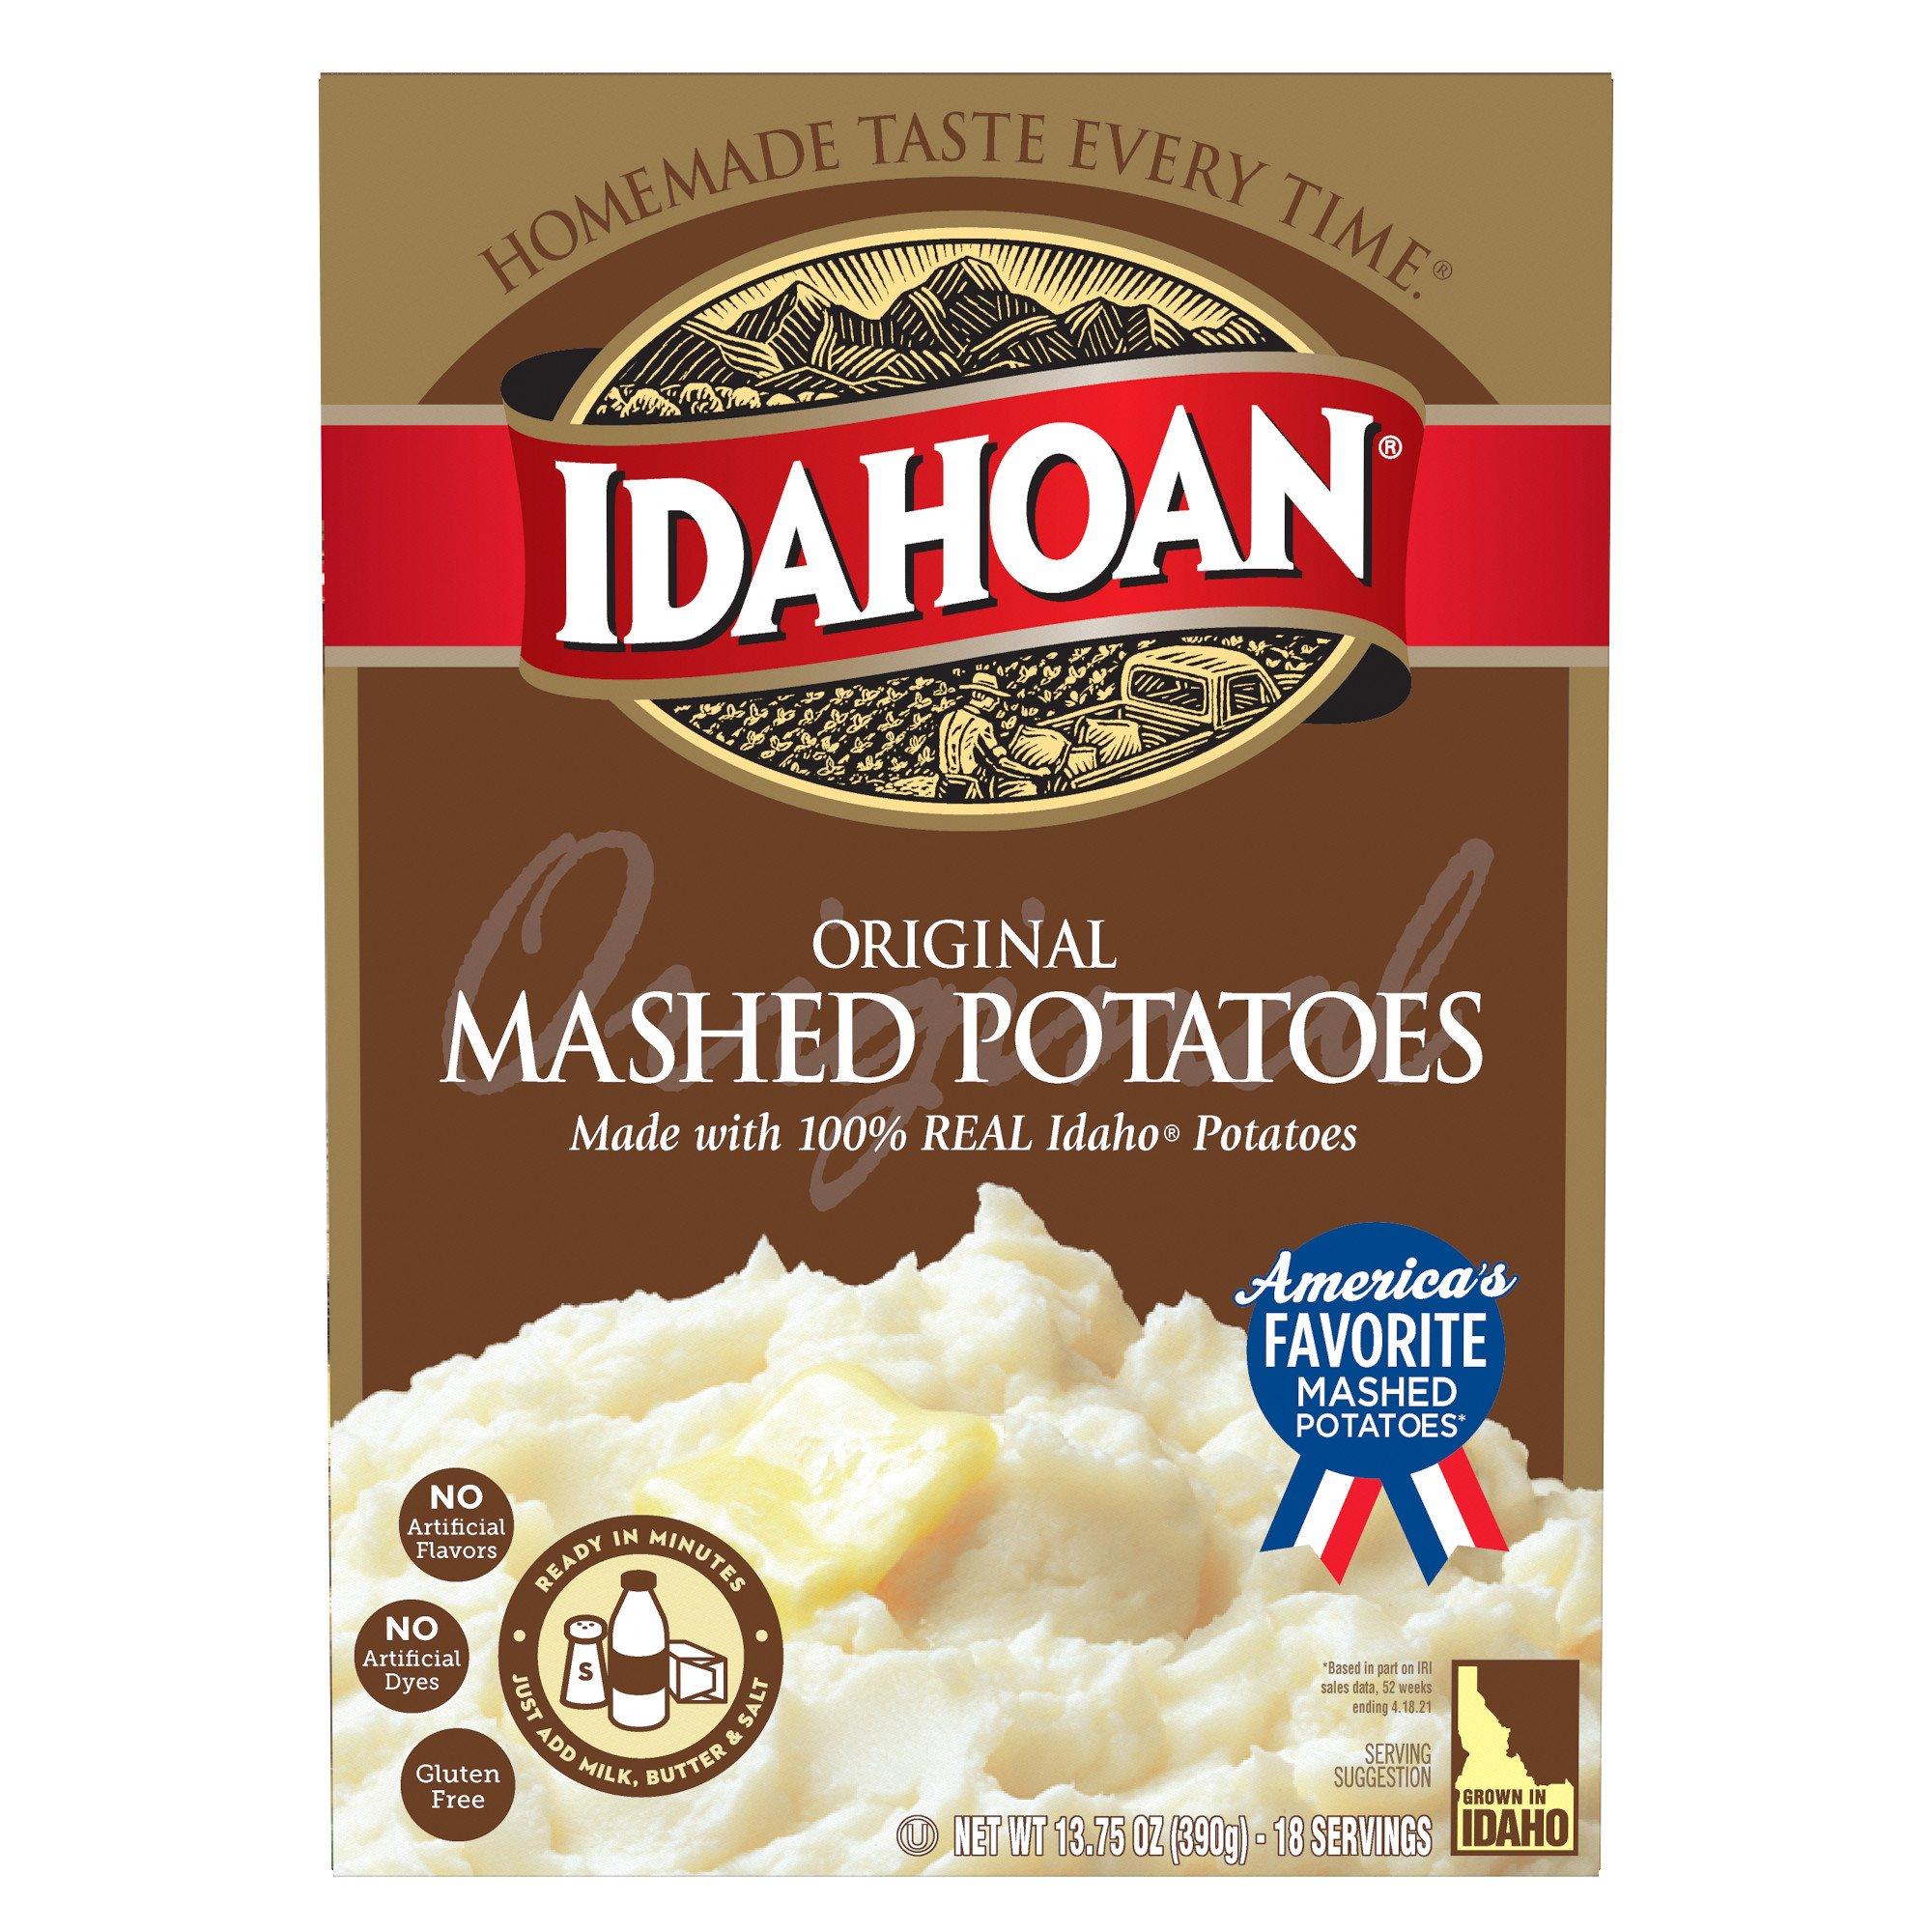 Idahoan Instant Mashed Potatoes on box of instant potatoes, instant red potatoes, idahoan instant potatoes coupons, idahoan instant potato cups, herbed potatoes, baked potato, lyonnaise potatoes, trader joe's roasted potatoes, duchess potatoes, idahoan baked potatoes, ore-ida frozen potatoes, bangers and mash, idahoan instant potatoes directions, printable coupons for idahoan potatoes, yukon gold potatoes, slow cooker breakfast potatoes, pumpkin pie, potato chip, butter herb potatoes, shepherd's pie, boxed potatoes, pecan pie, wada farms potatoes, apple sauce, idahoan instant potatoes nutrition, walmart instant potatoes, olivier salad, idahoan hash brown potatoes, pommes dauphine, potato scone, green bean casserole, potato salad, apple pie, potato bread, russet burbank, make your own instant potatoes, bag potatoes,